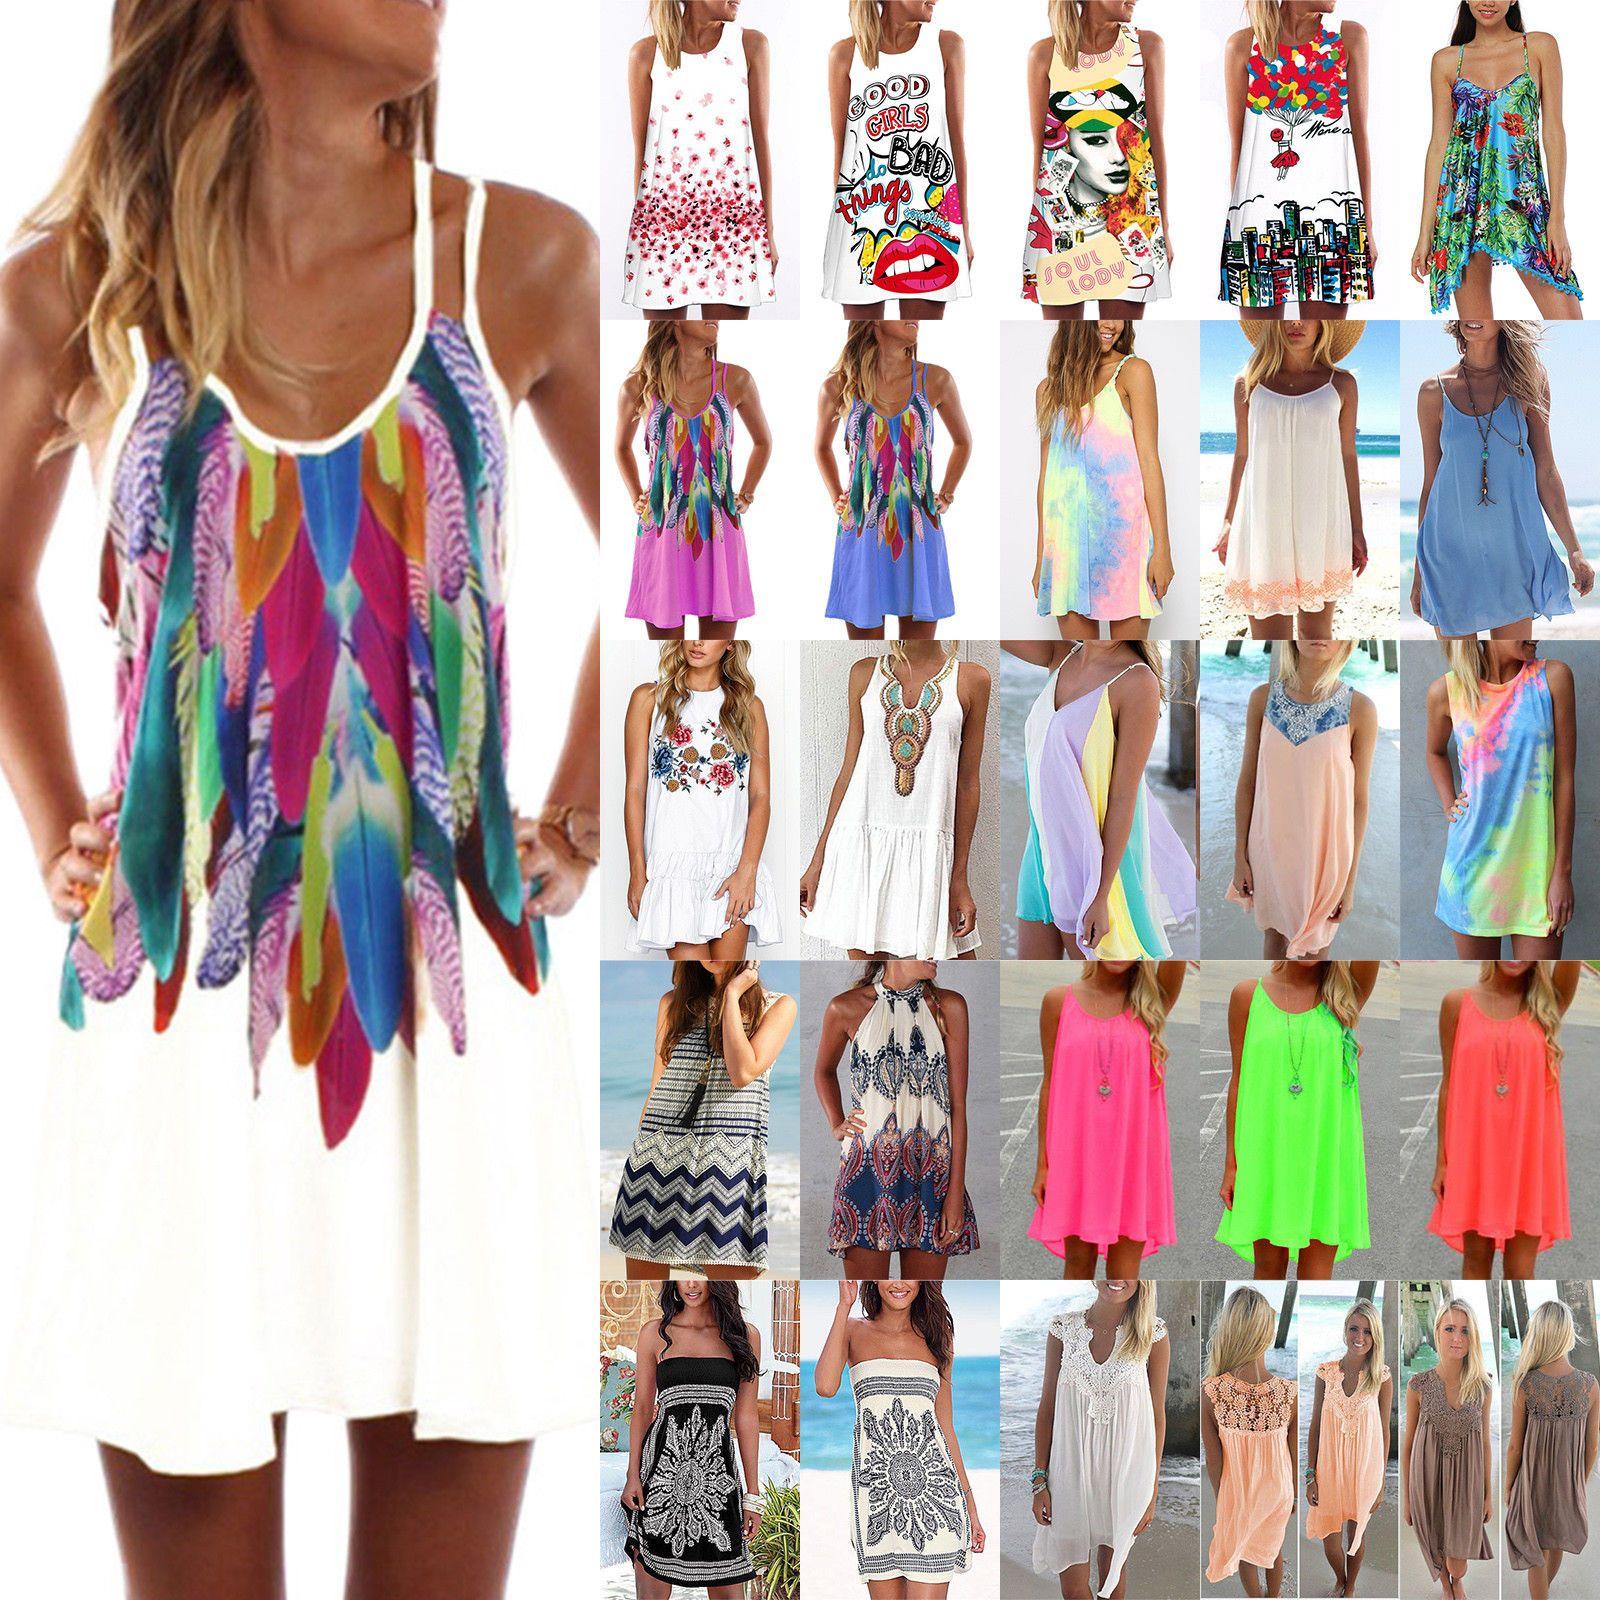 Womens Boho Sleeveless Summer Beach Mini Dress Holiday Tank Tops Bikini Cover Up Shirt Dresses Idea Mini Dresses Summer Summer Dresses Summer Outfits Women [ 1600 x 1600 Pixel ]